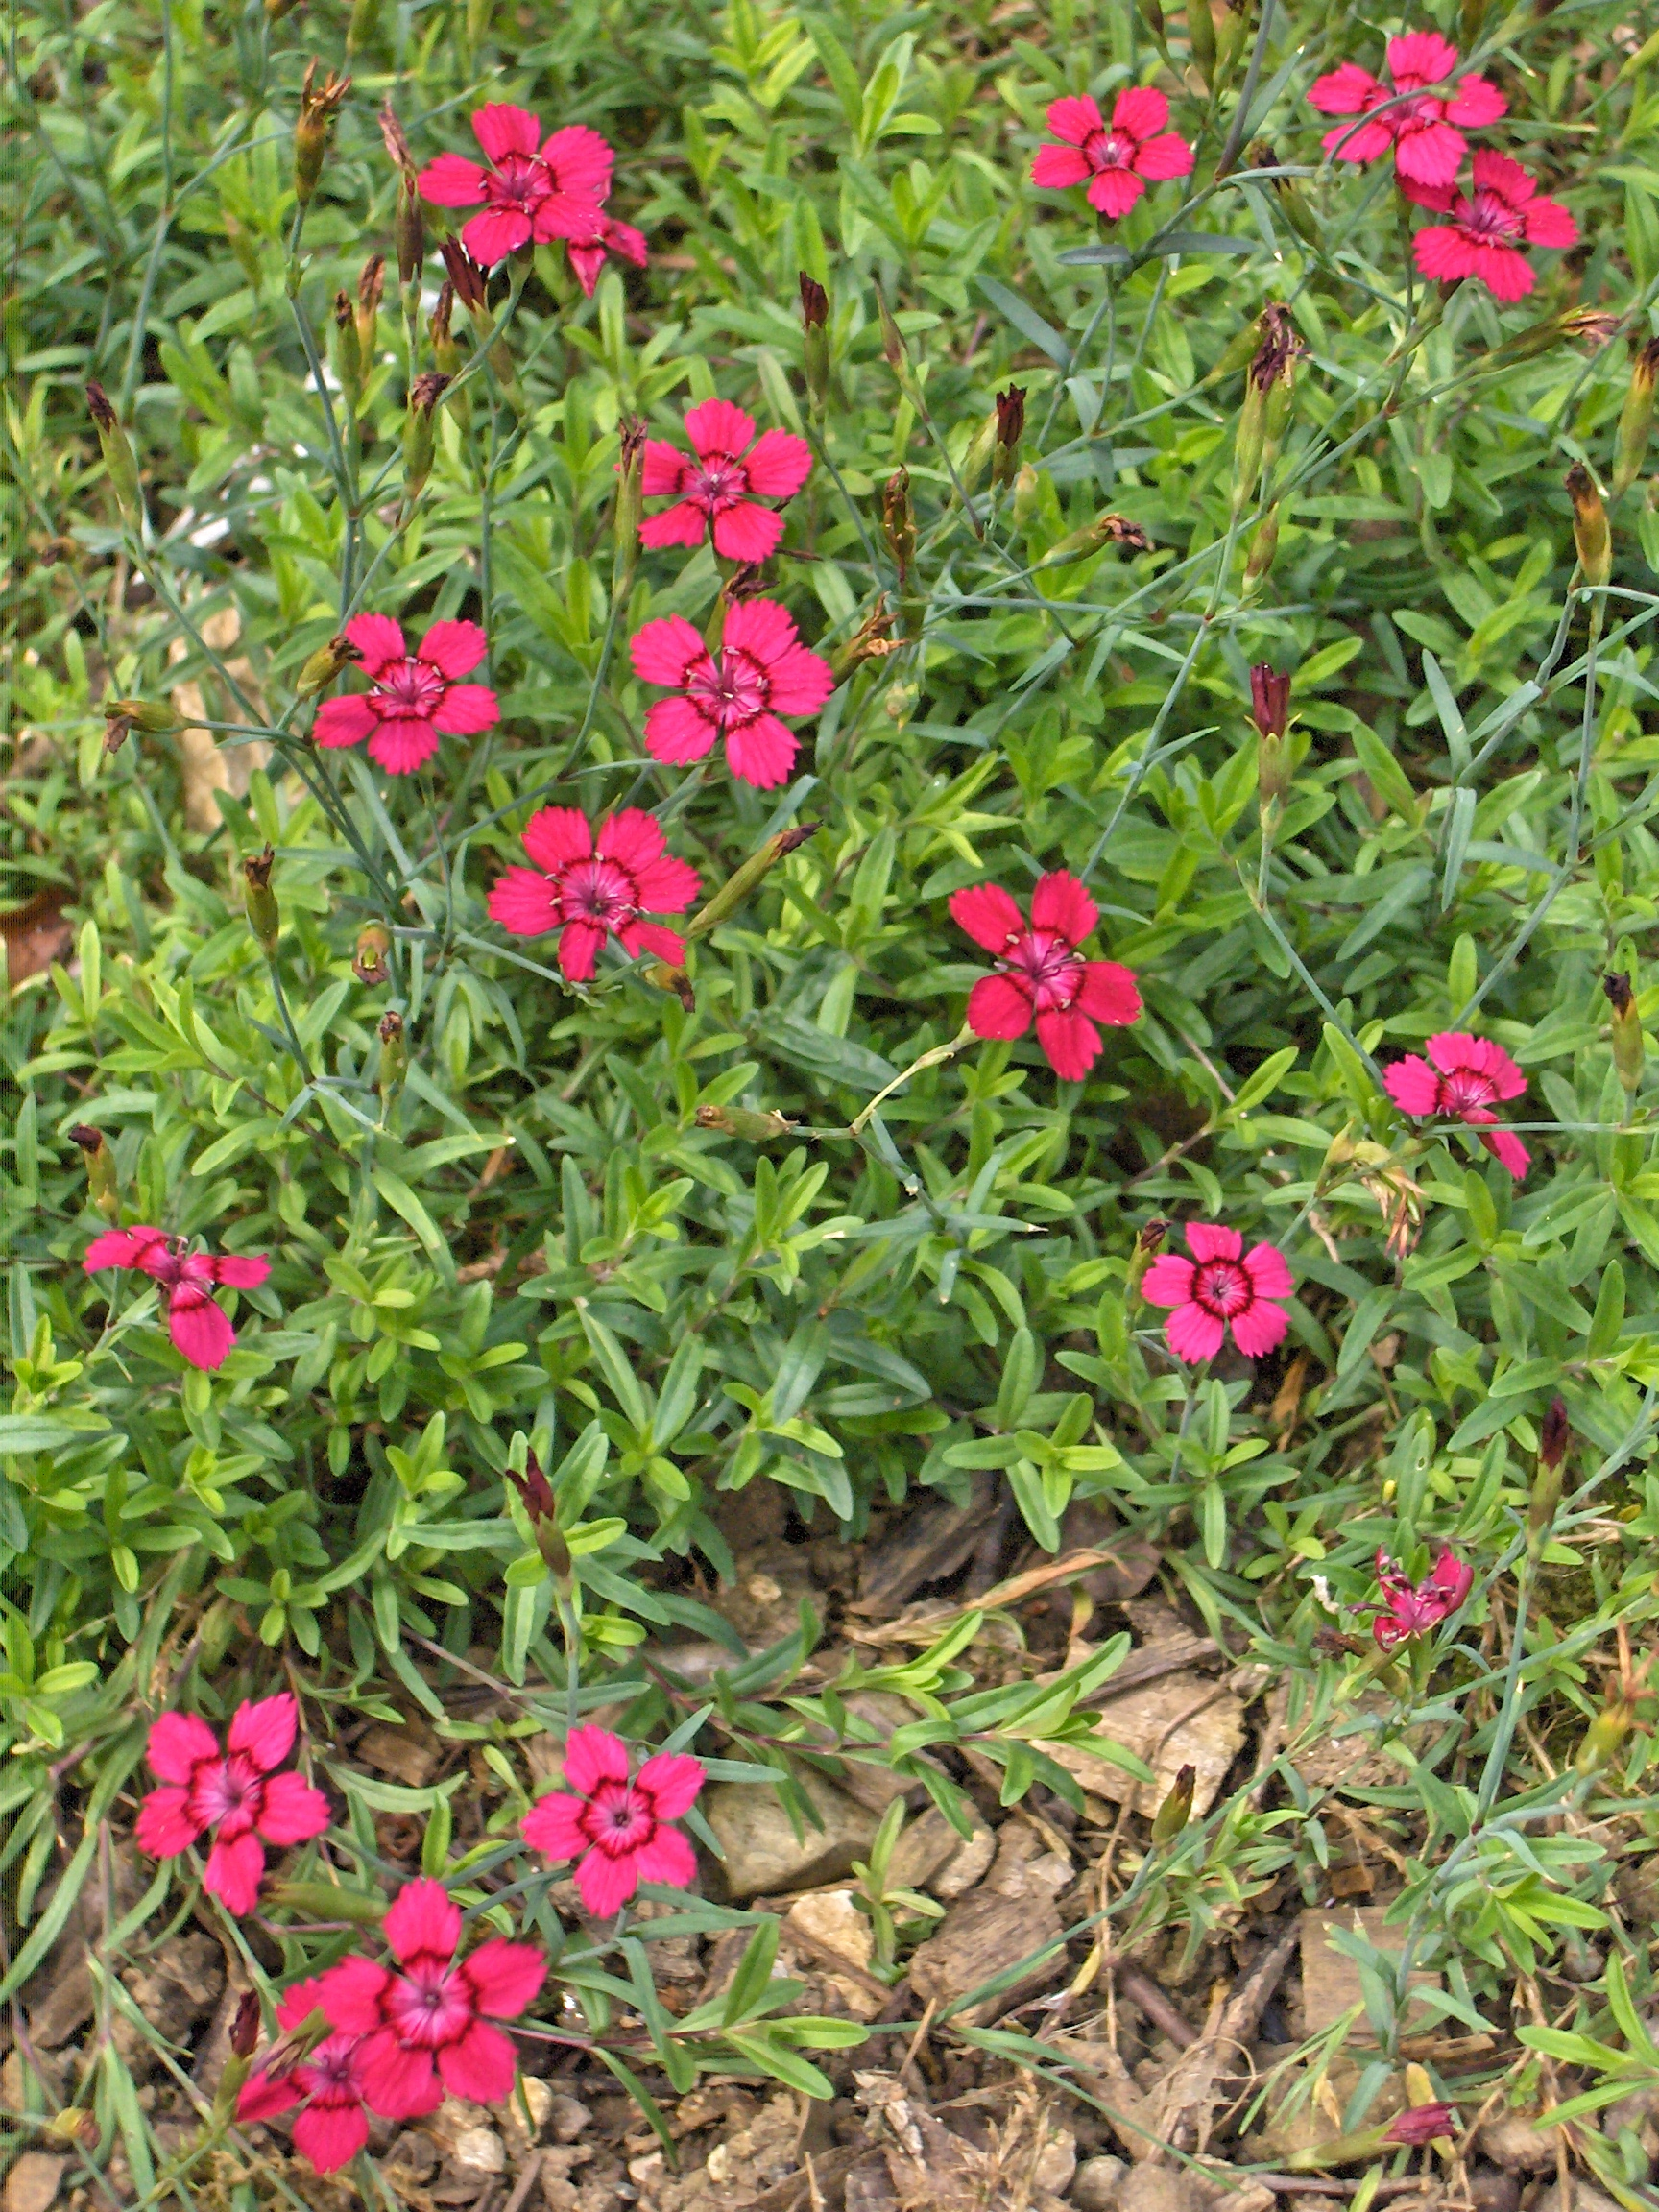 File:Dianthus deltoides Brilliant.JPG - Wikimedia Commons